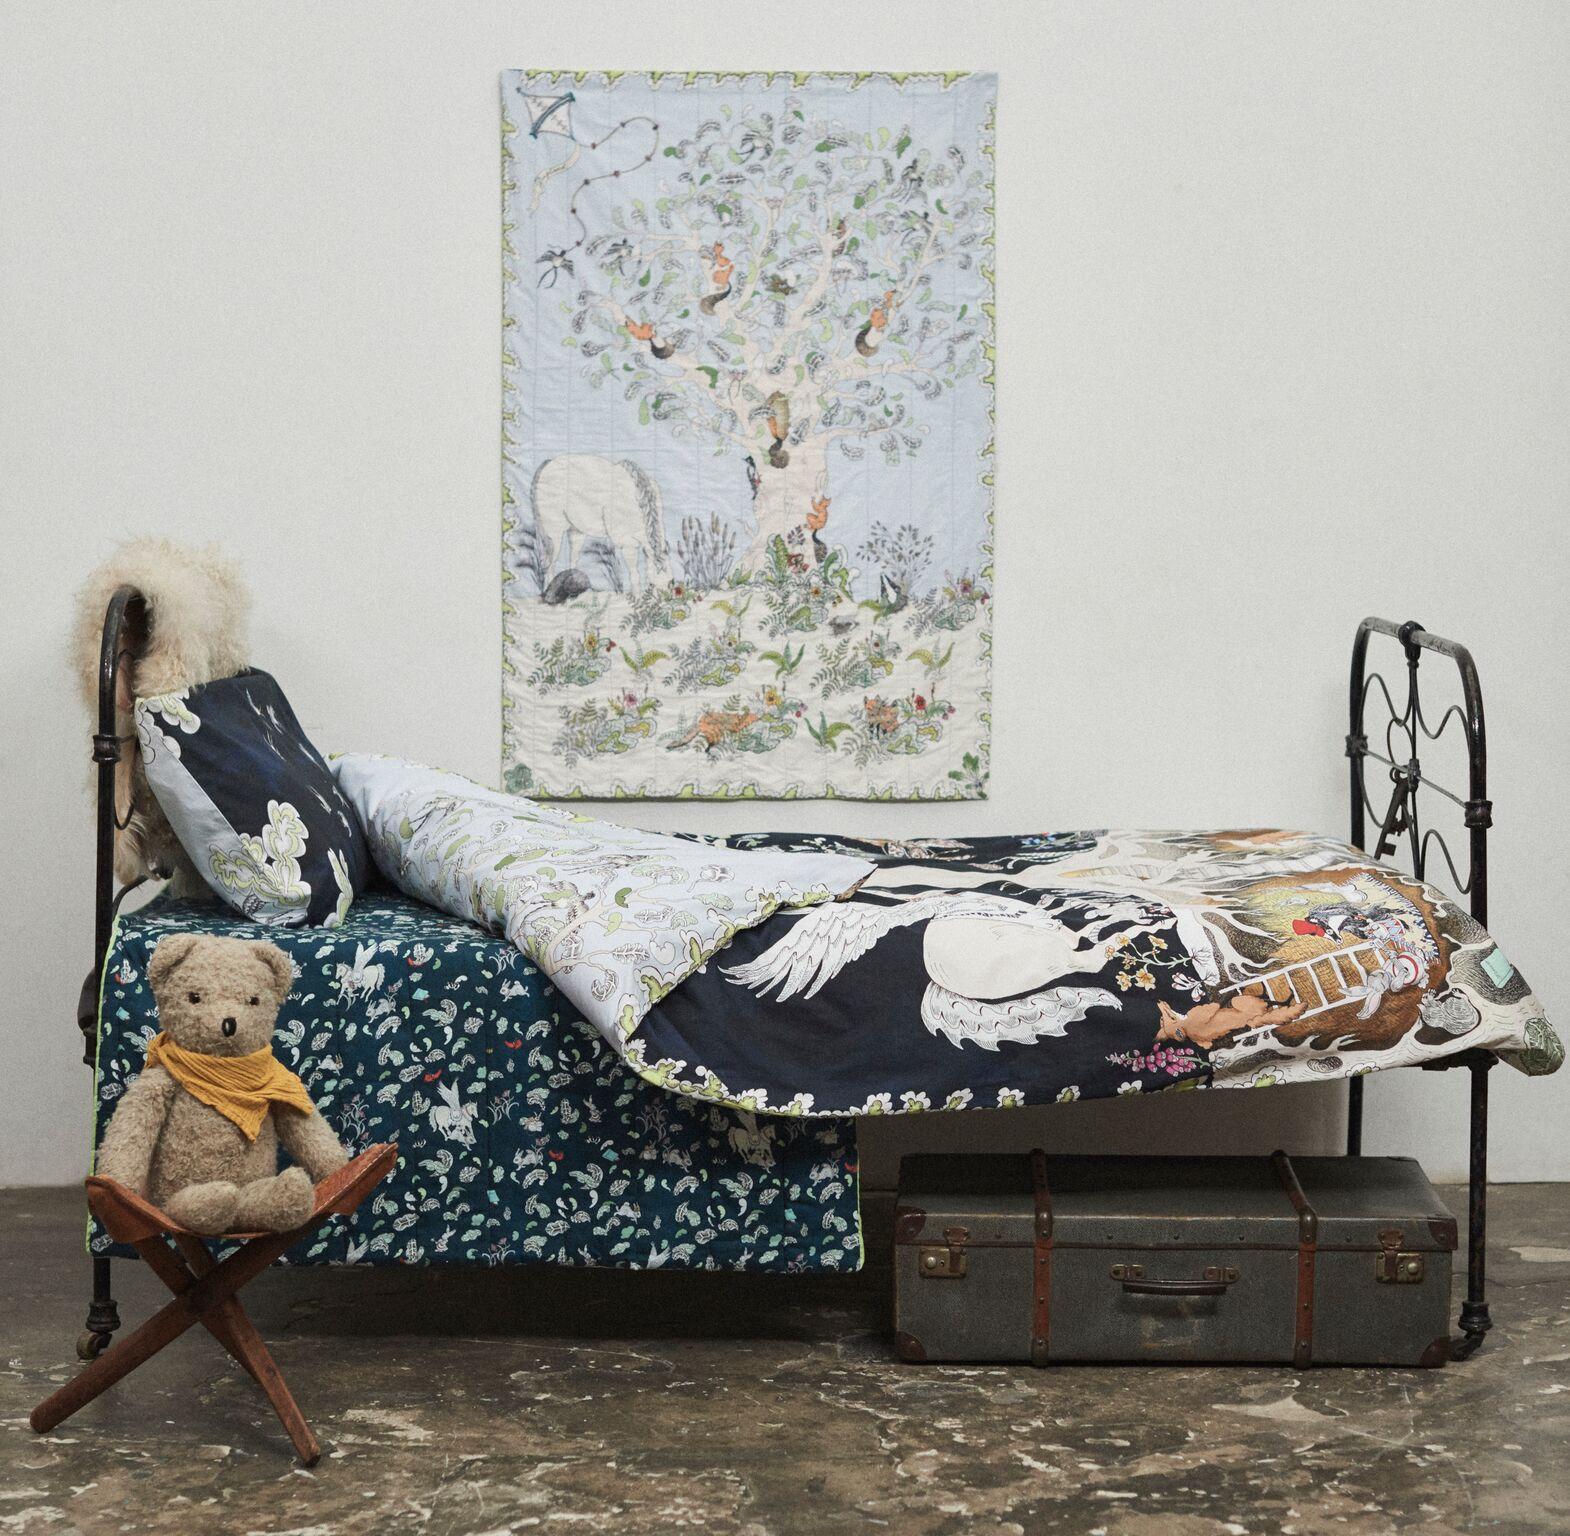 Magical children's bedding